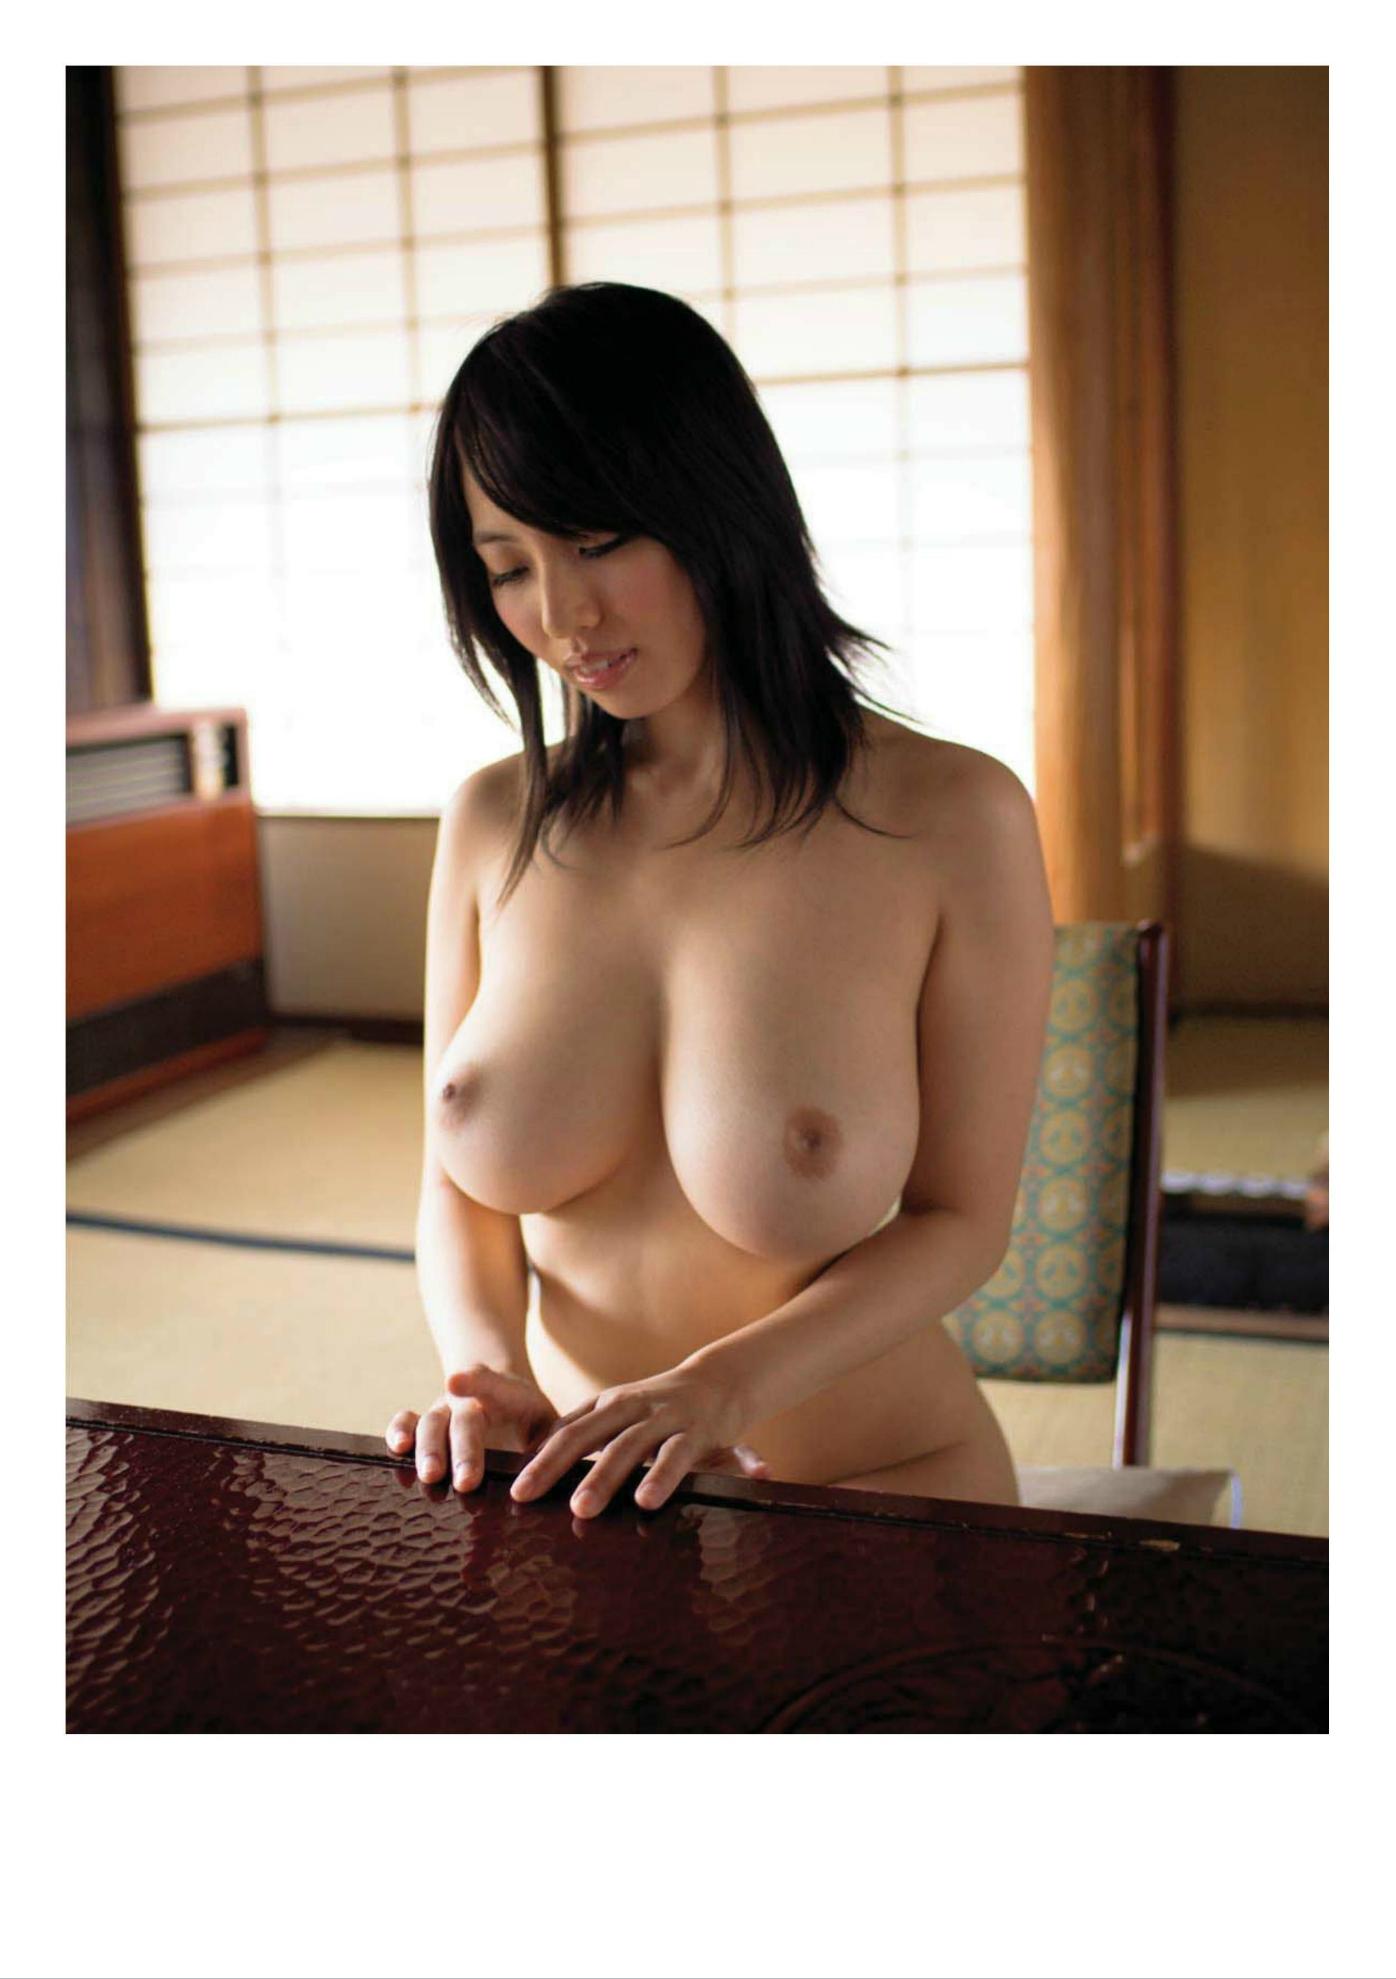 image http://scanlover.com/assets/images/2952-wRTkBi4Xus4x1kkP.jpeg